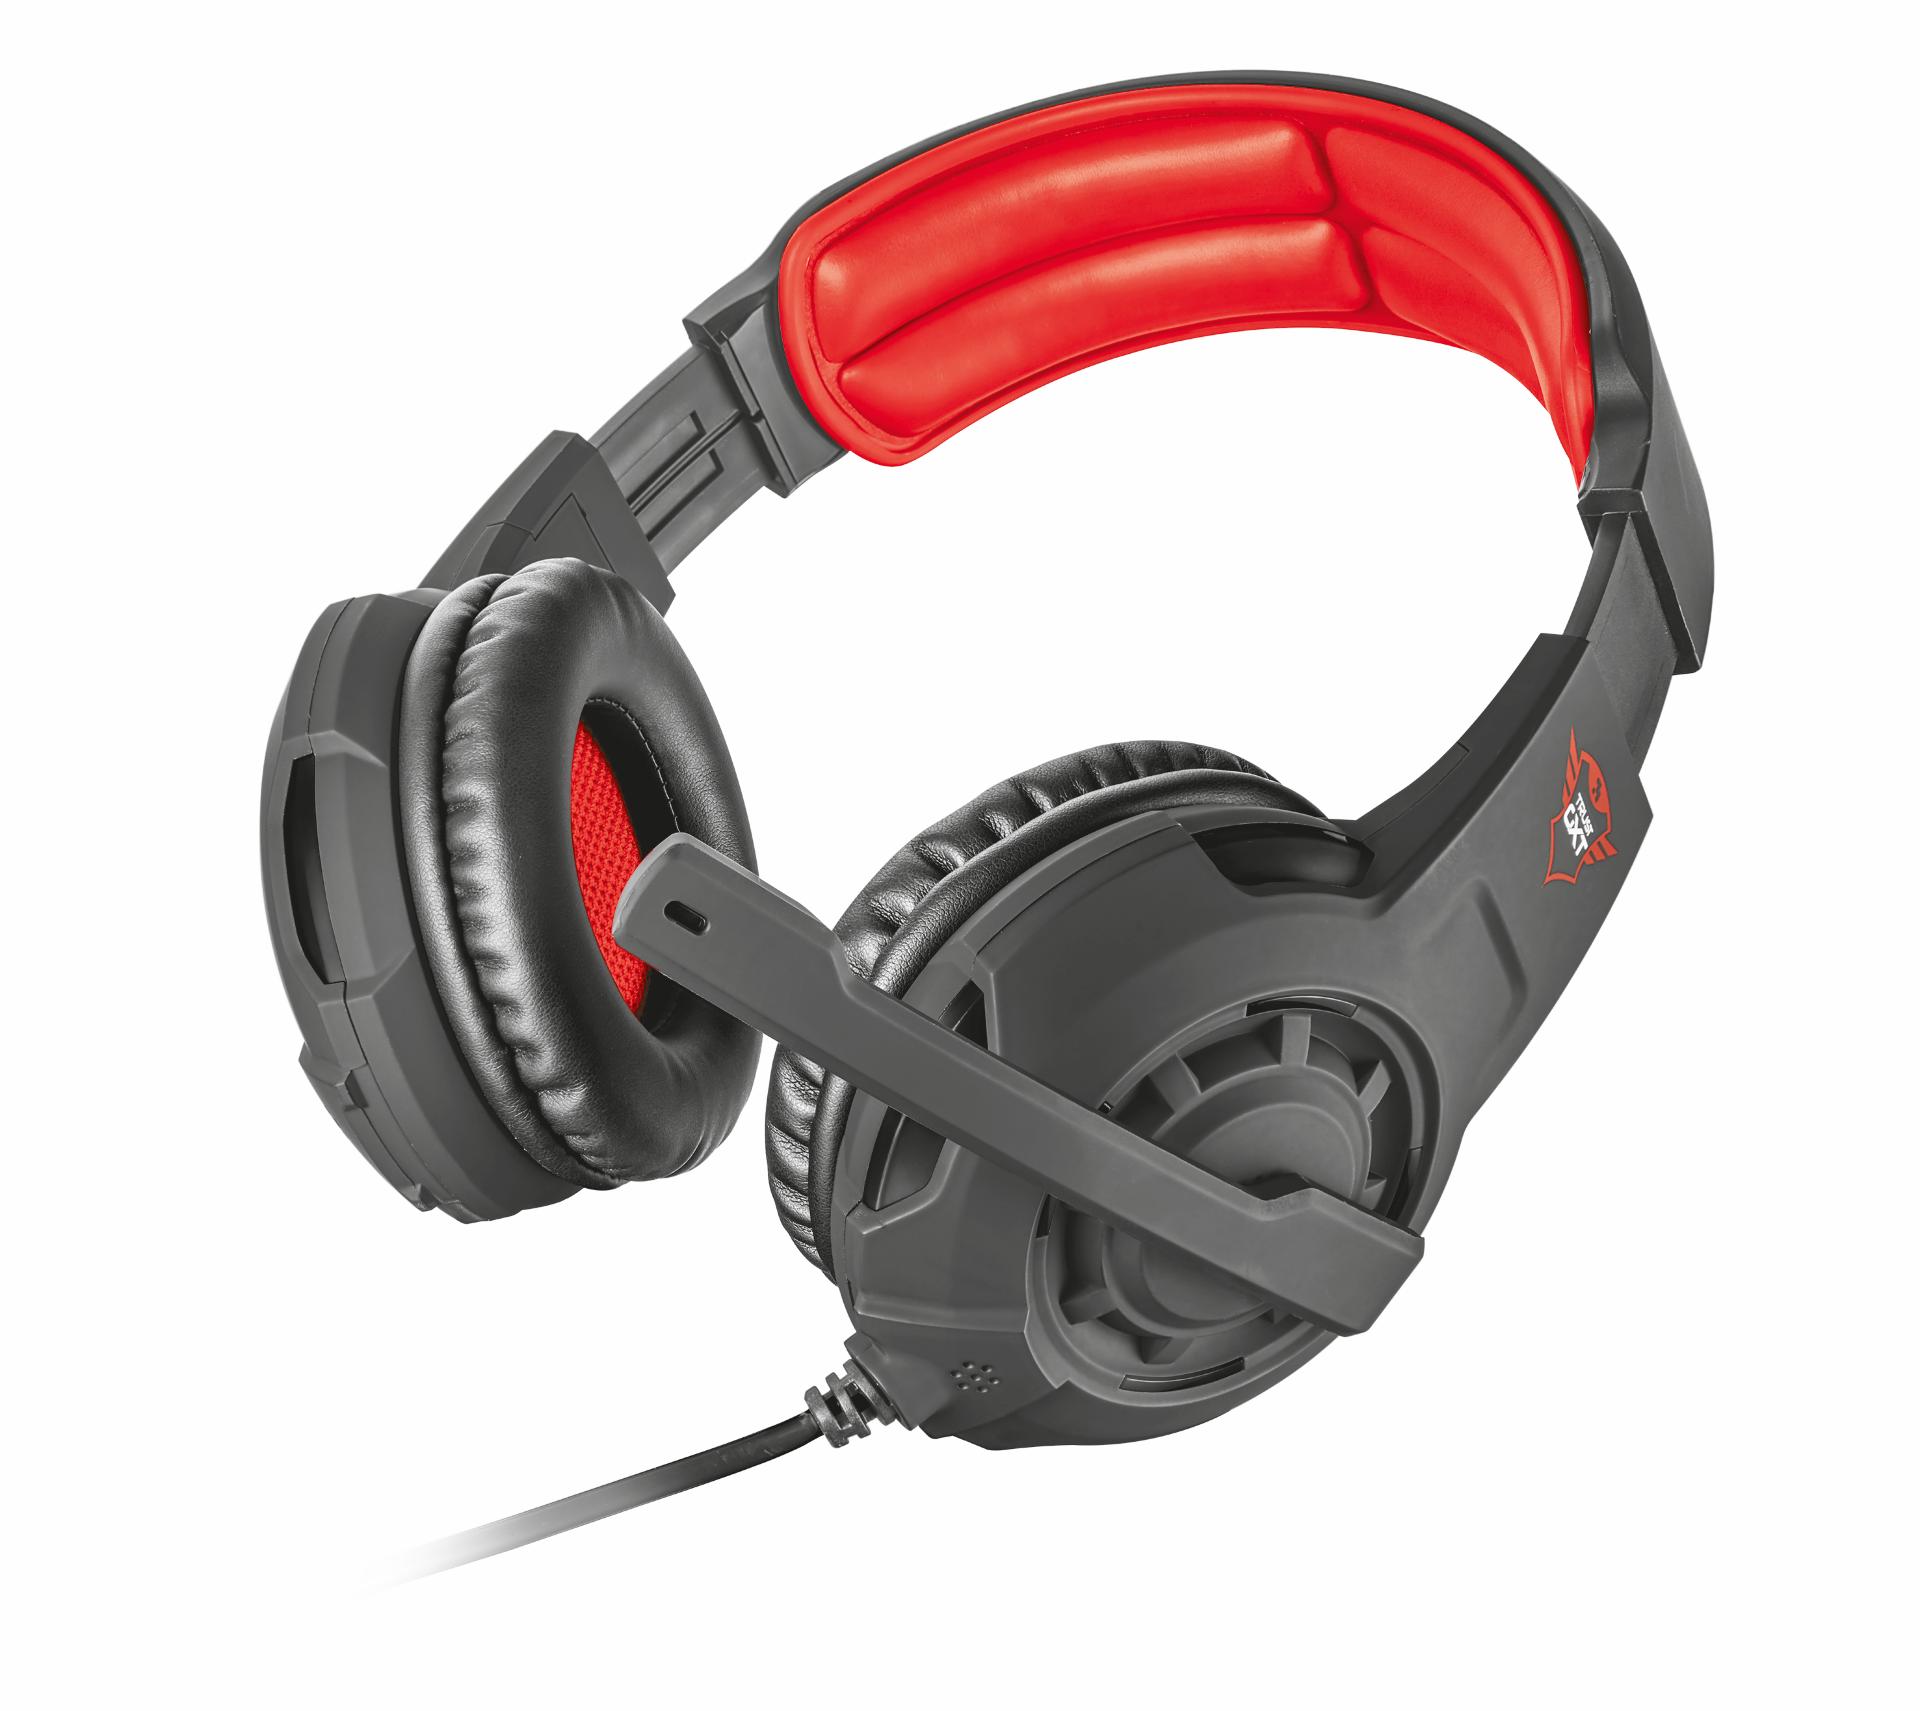 bf20c3f8129 PC слушалки TRUST 21187 GXT-310 GAMING HEADSET - Техномаркет